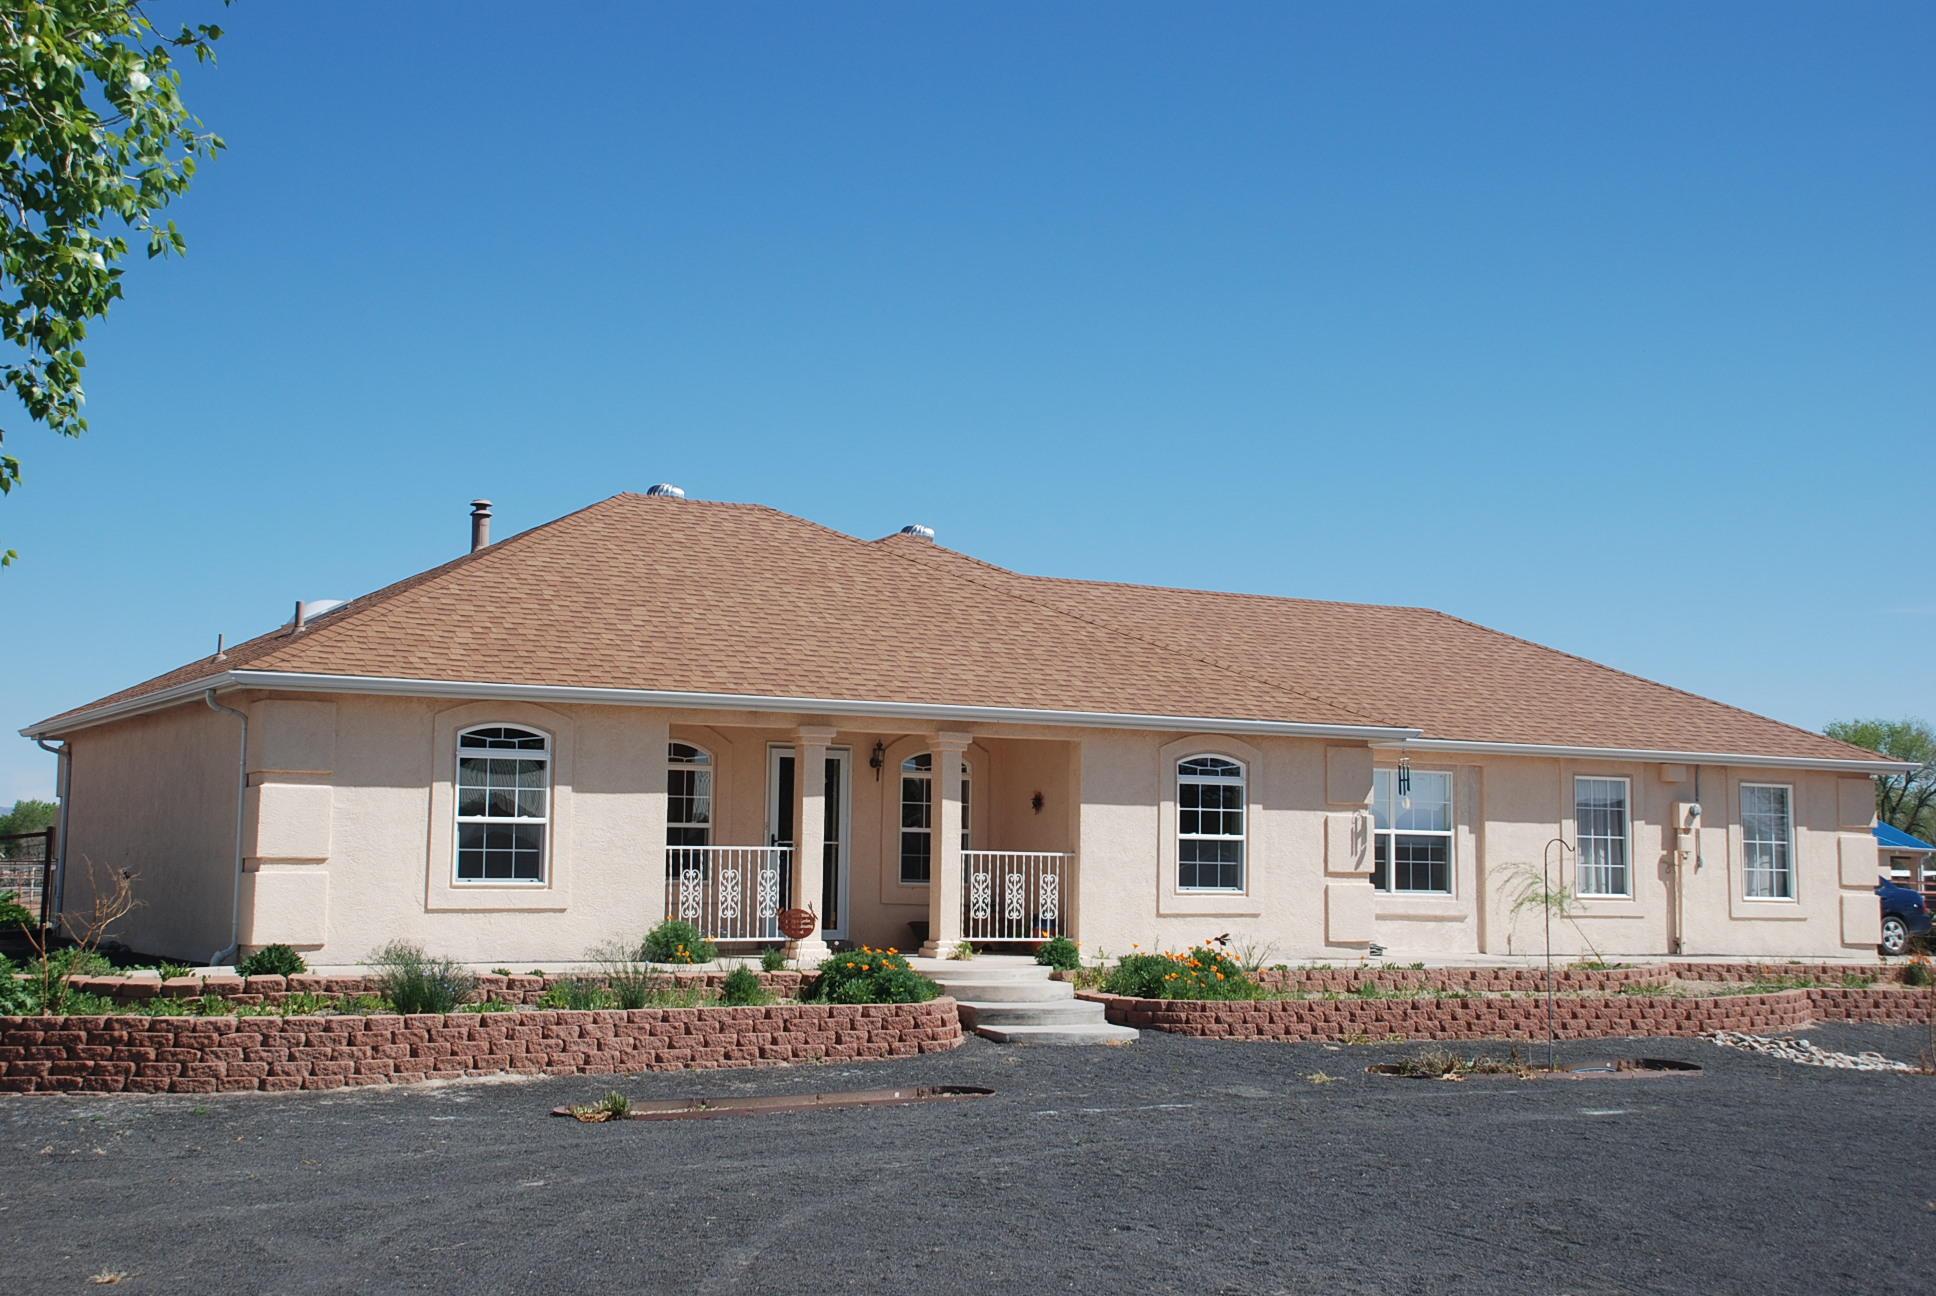 8 LAS AGUILAS Road, Belen, NM 87002 - Belen, NM real estate listing